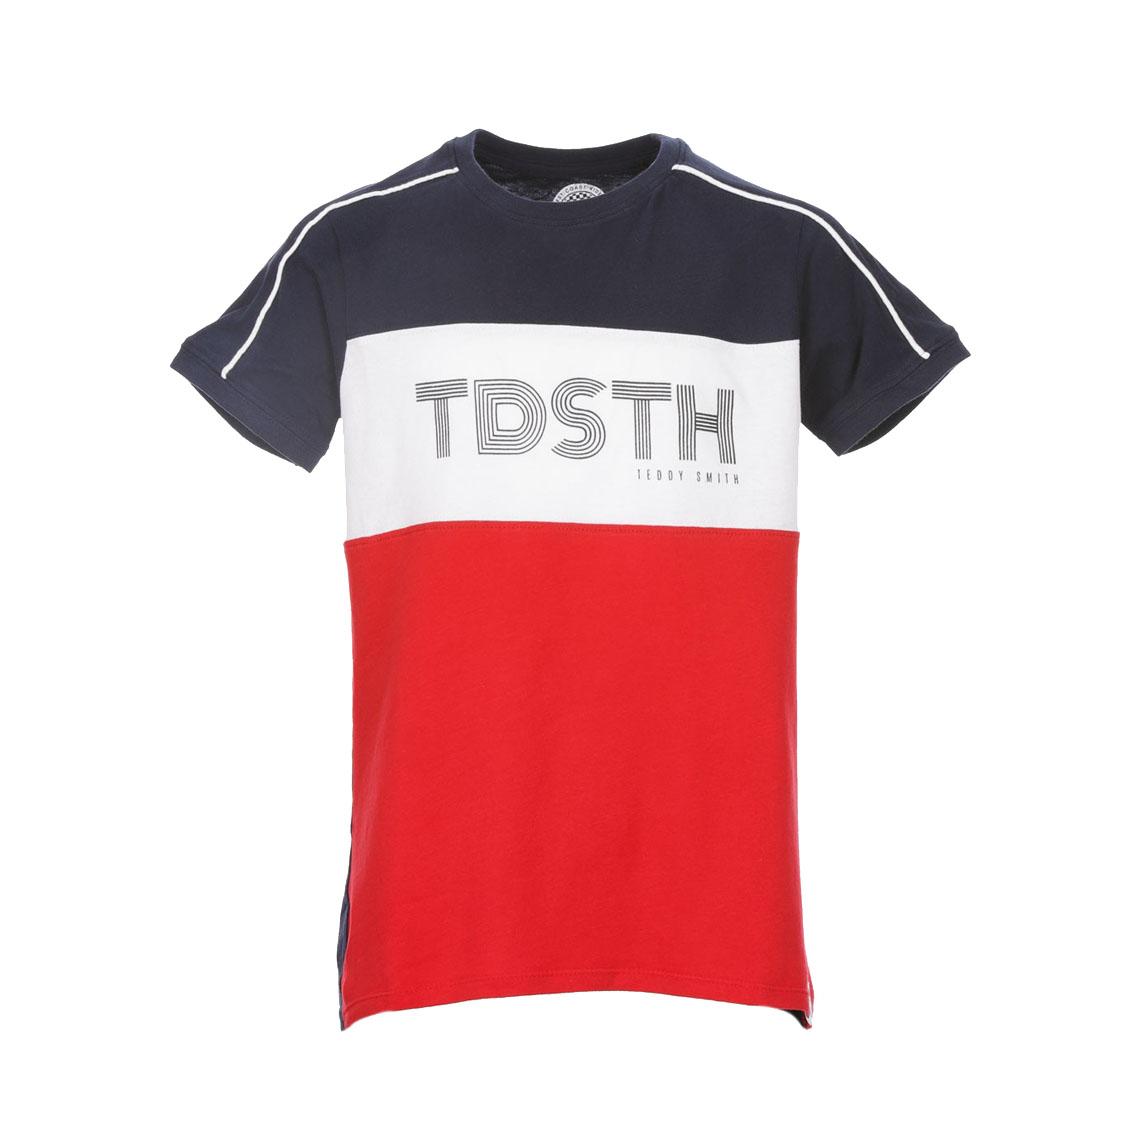 Tee-shirt col rond  thou en coton bleu marine, rouge et blanc